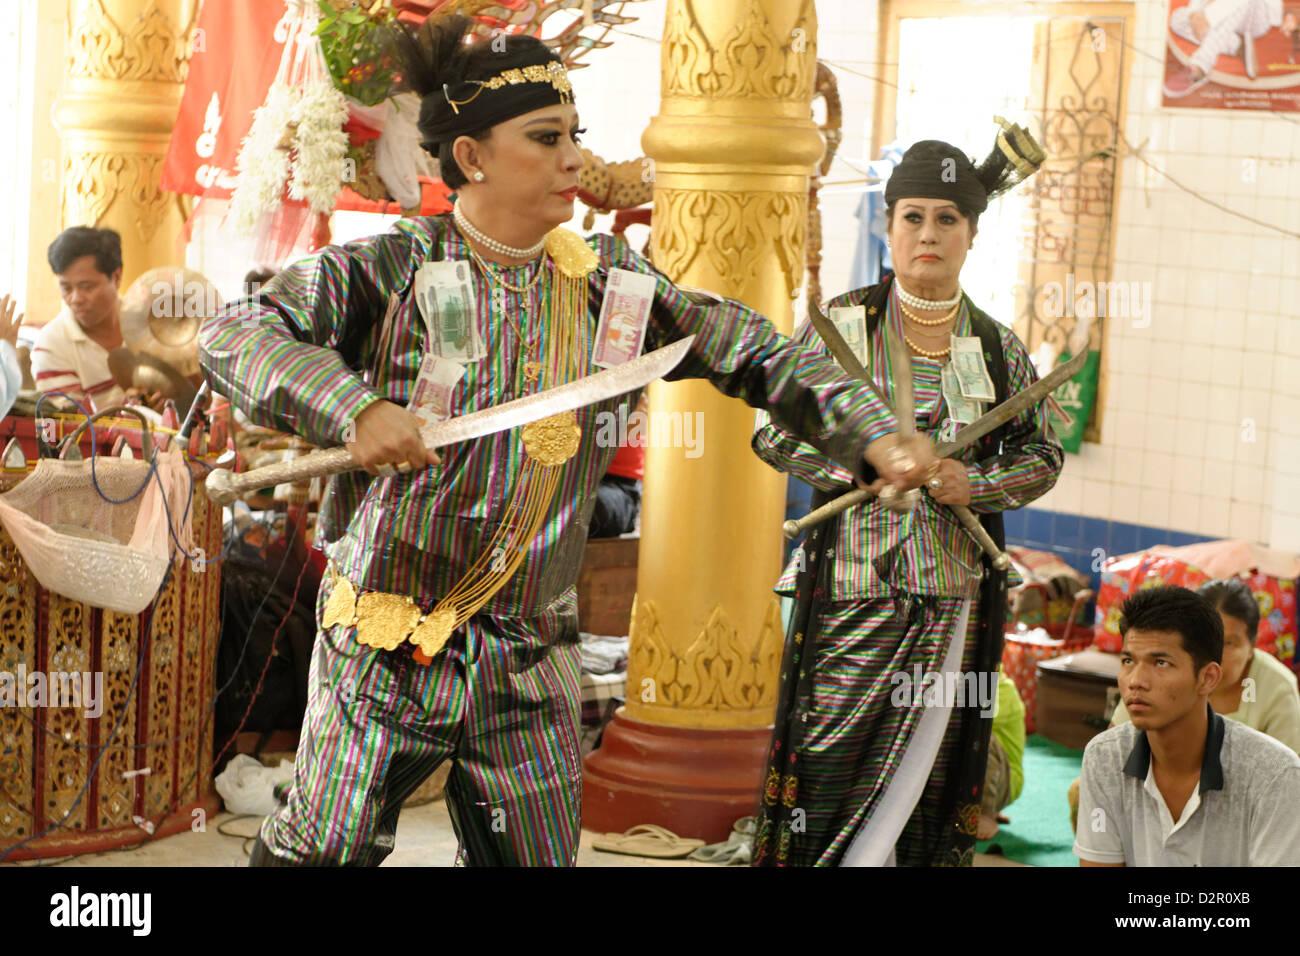 Yangon U Win Hlaing, un famoso nat-kadaw (medie), Festival di Ko Myo Shin, Pyin U Lwin (Maymyo), Divisione Mandalay, Immagini Stock